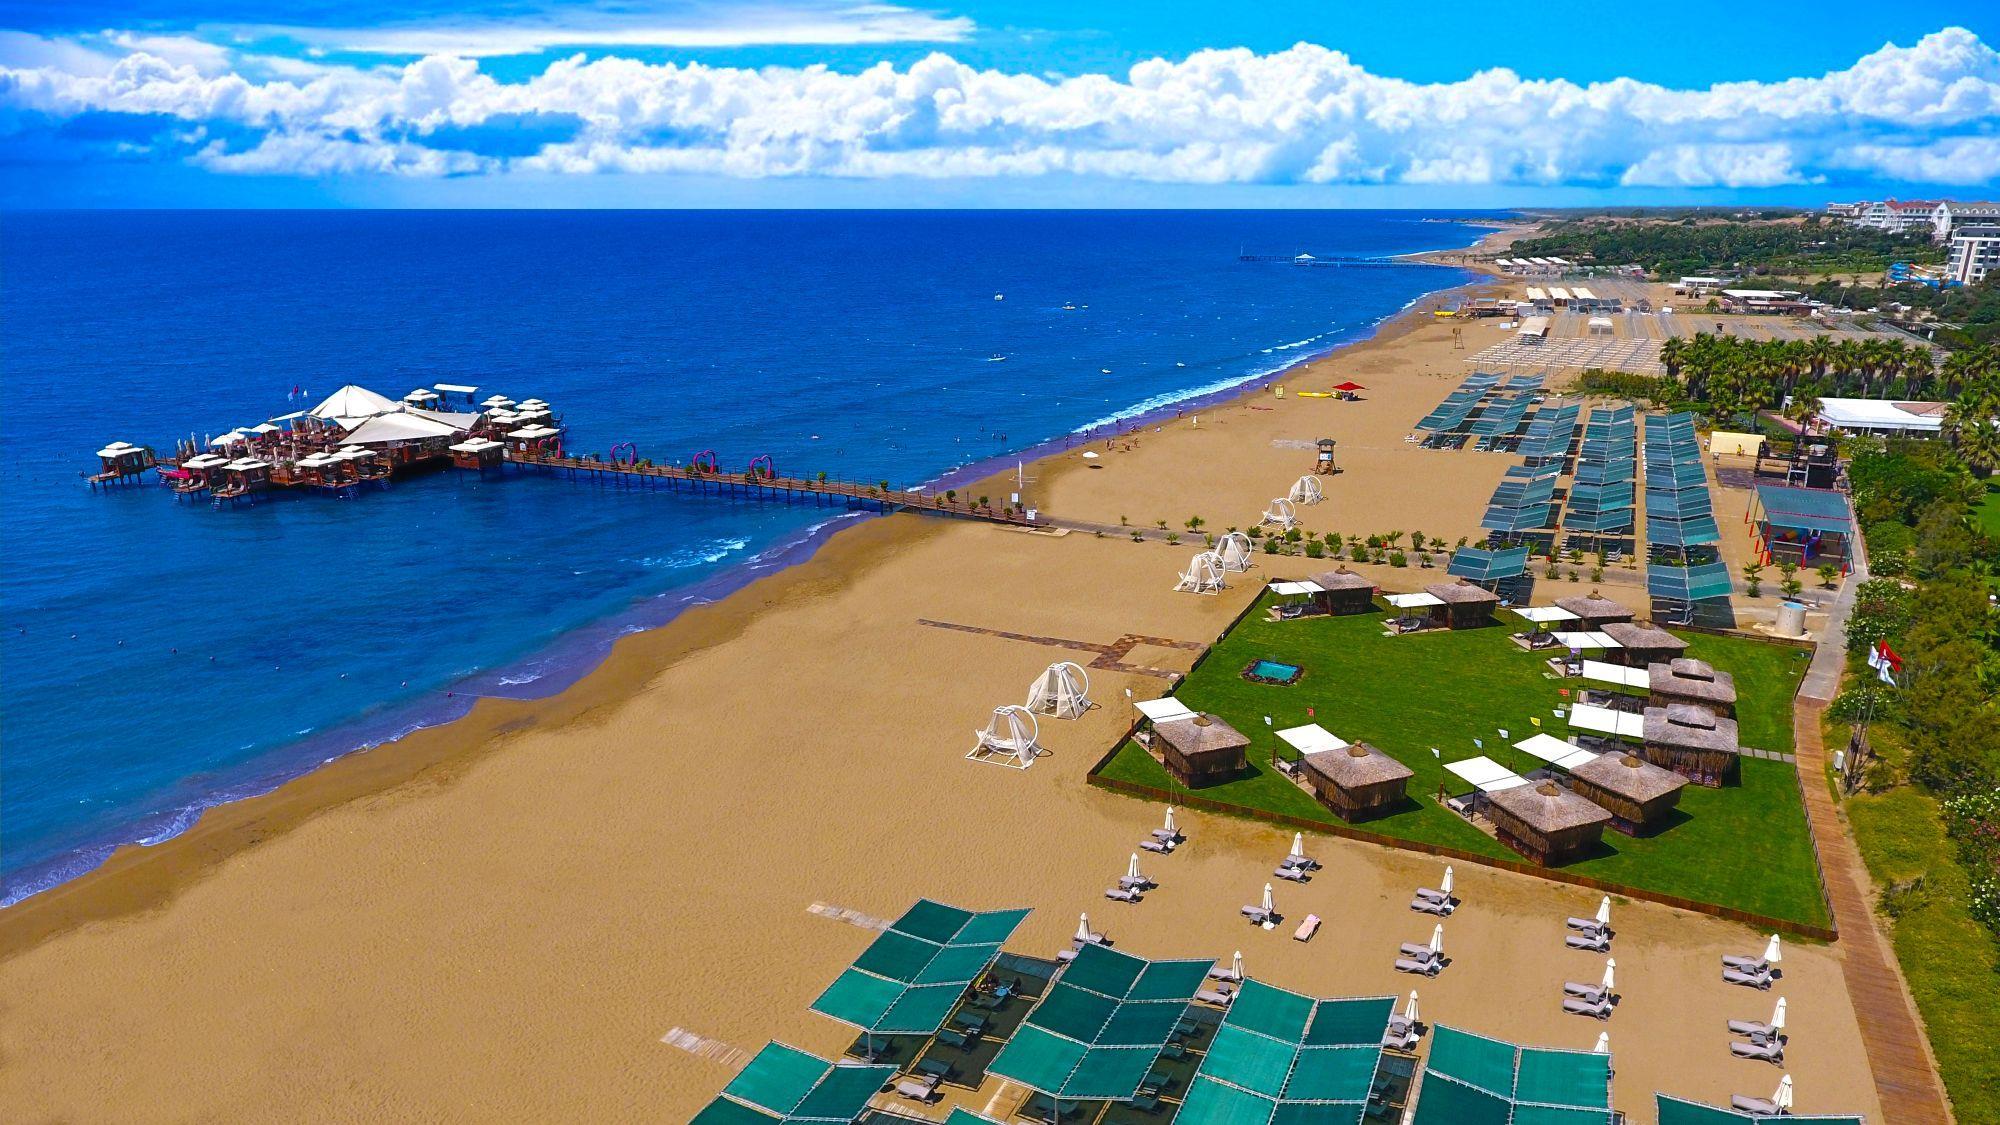 http://www.orextravel.sk/OREX/hotelphotos/vonresort-golden-coast-general-0042.jpg